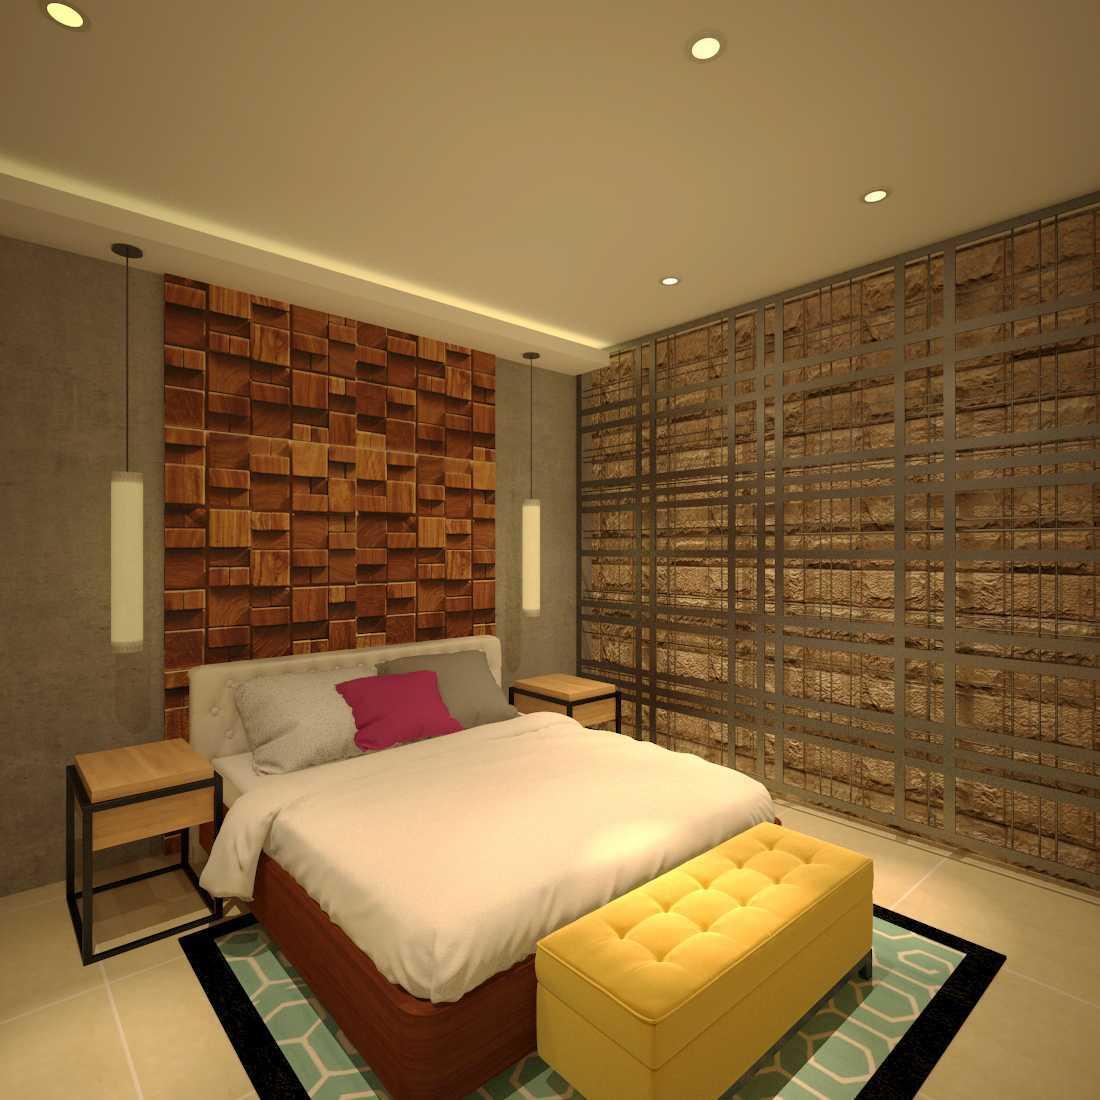 Sense Studio Villa - Bpk Rudy Bali, Indonesia Bali, Indonesia Sense-Studio-Villa-Bpk-Rudy Kontemporer  51644